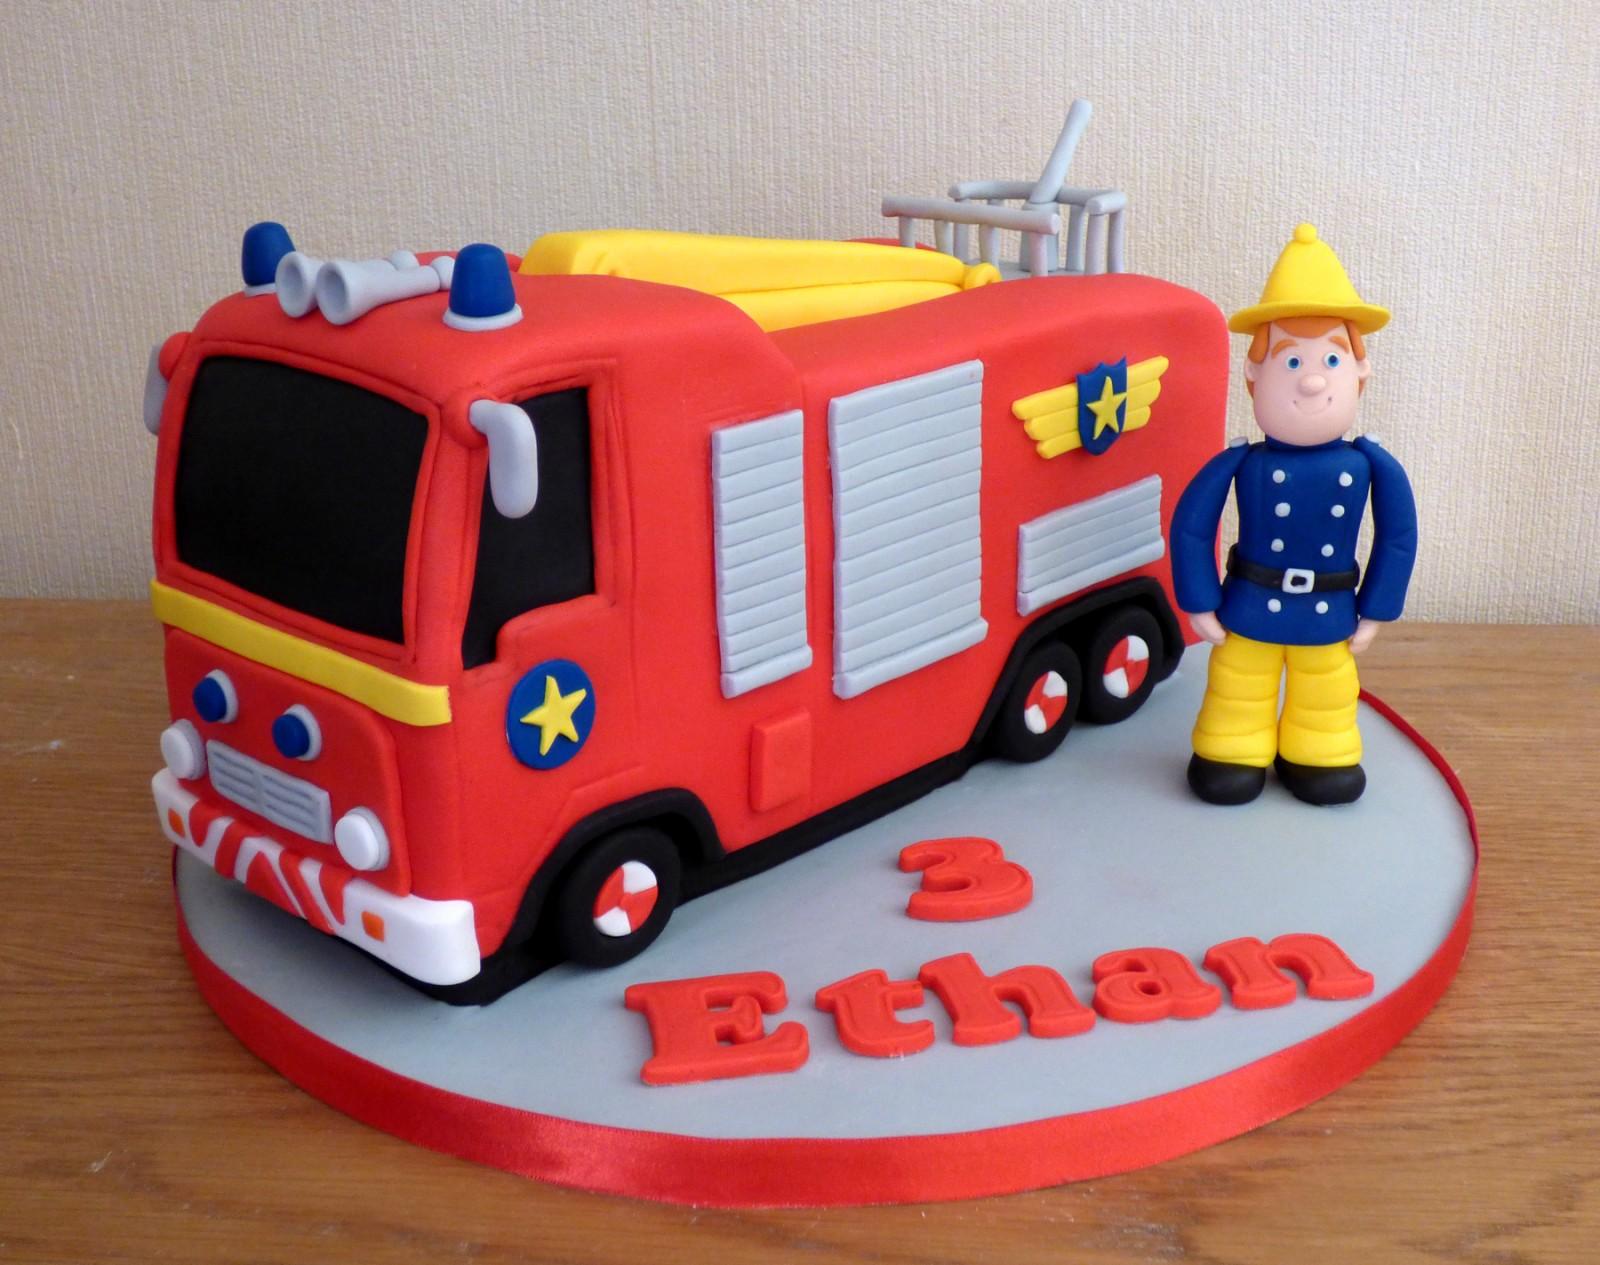 Miraculous Fireman Sam And Fire Engine Birthday Cake Susies Cakes Funny Birthday Cards Online Elaedamsfinfo